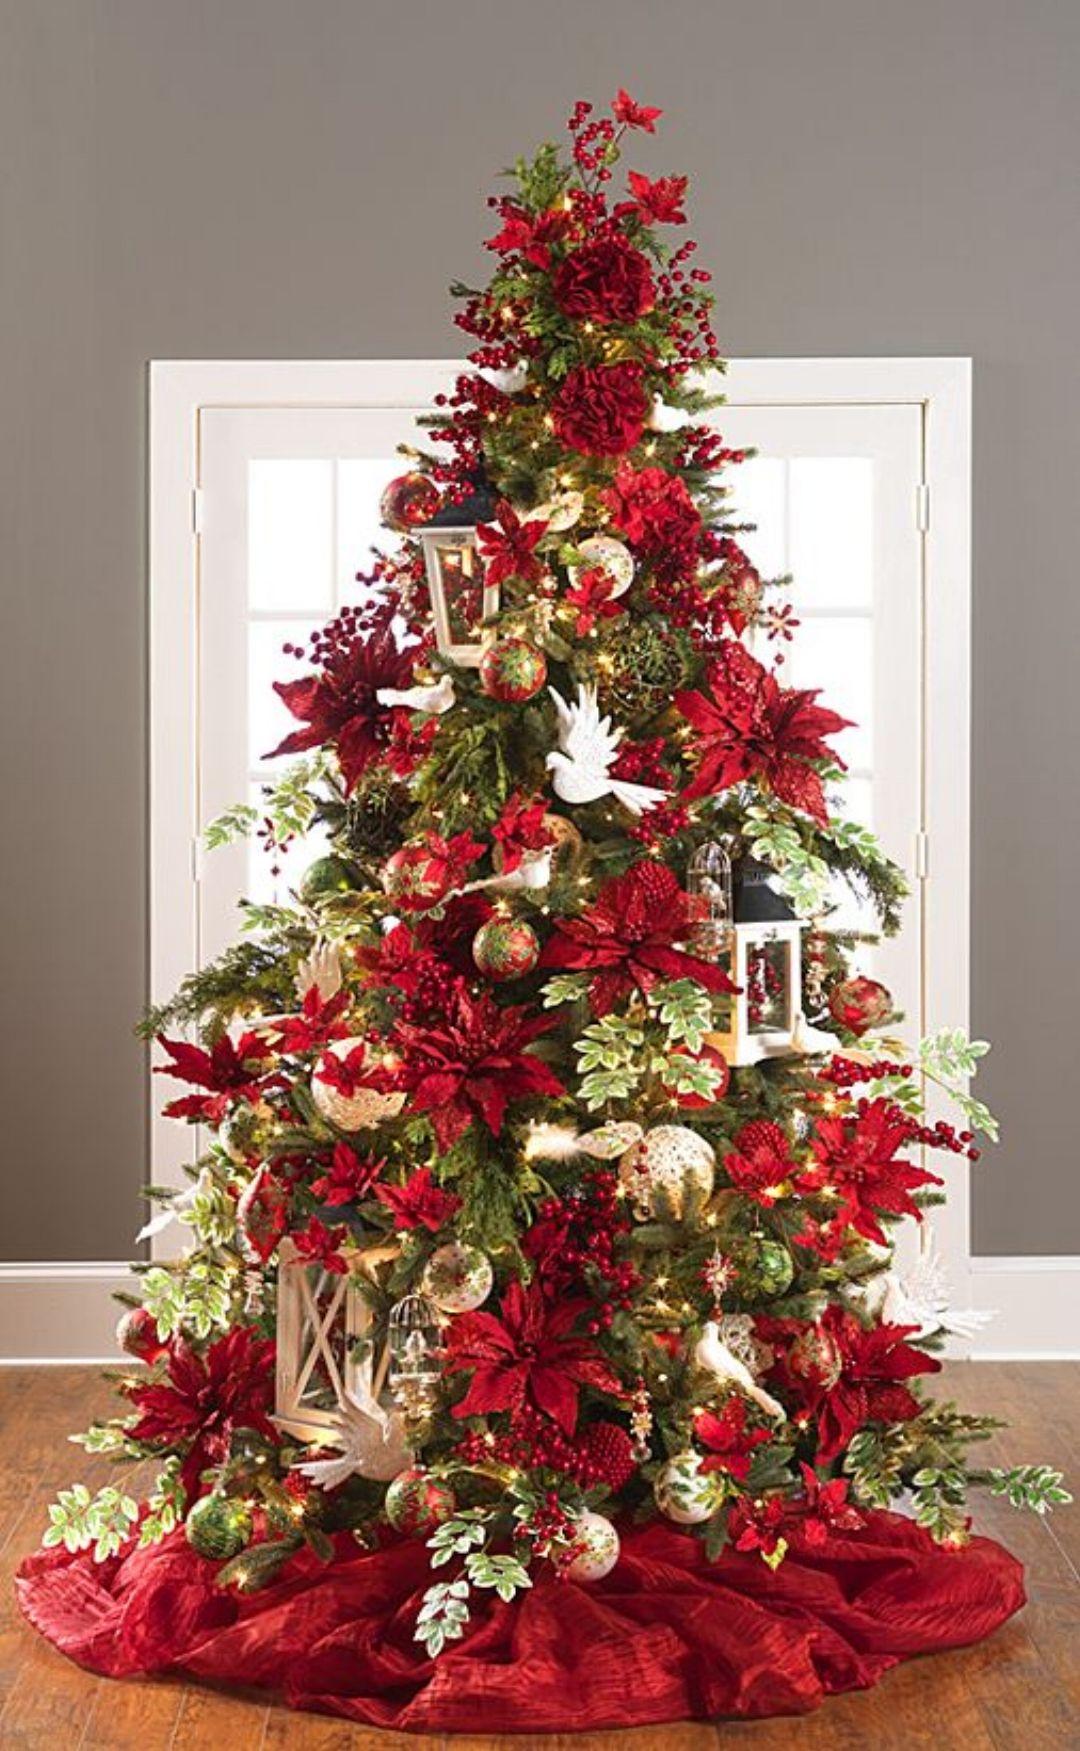 2014 Christmas Conservatory Tree By Raz Imports Green Christmas Tree Decorations Green Christmas Decorations Green Christmas Tree